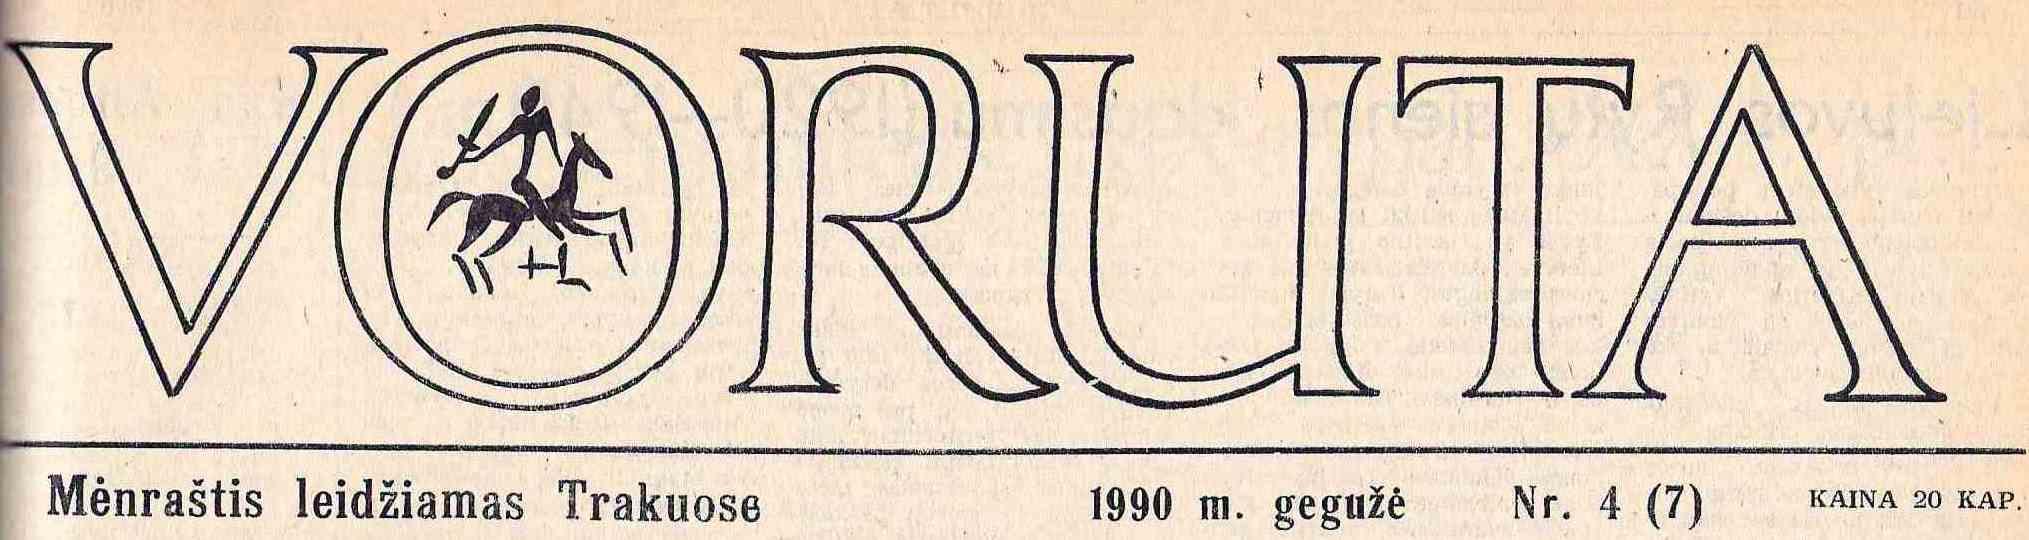 """Voruta"" antraštė su paminėta mėnraščio leidimo vieta – Trakai | Voruta.lt nuotr."